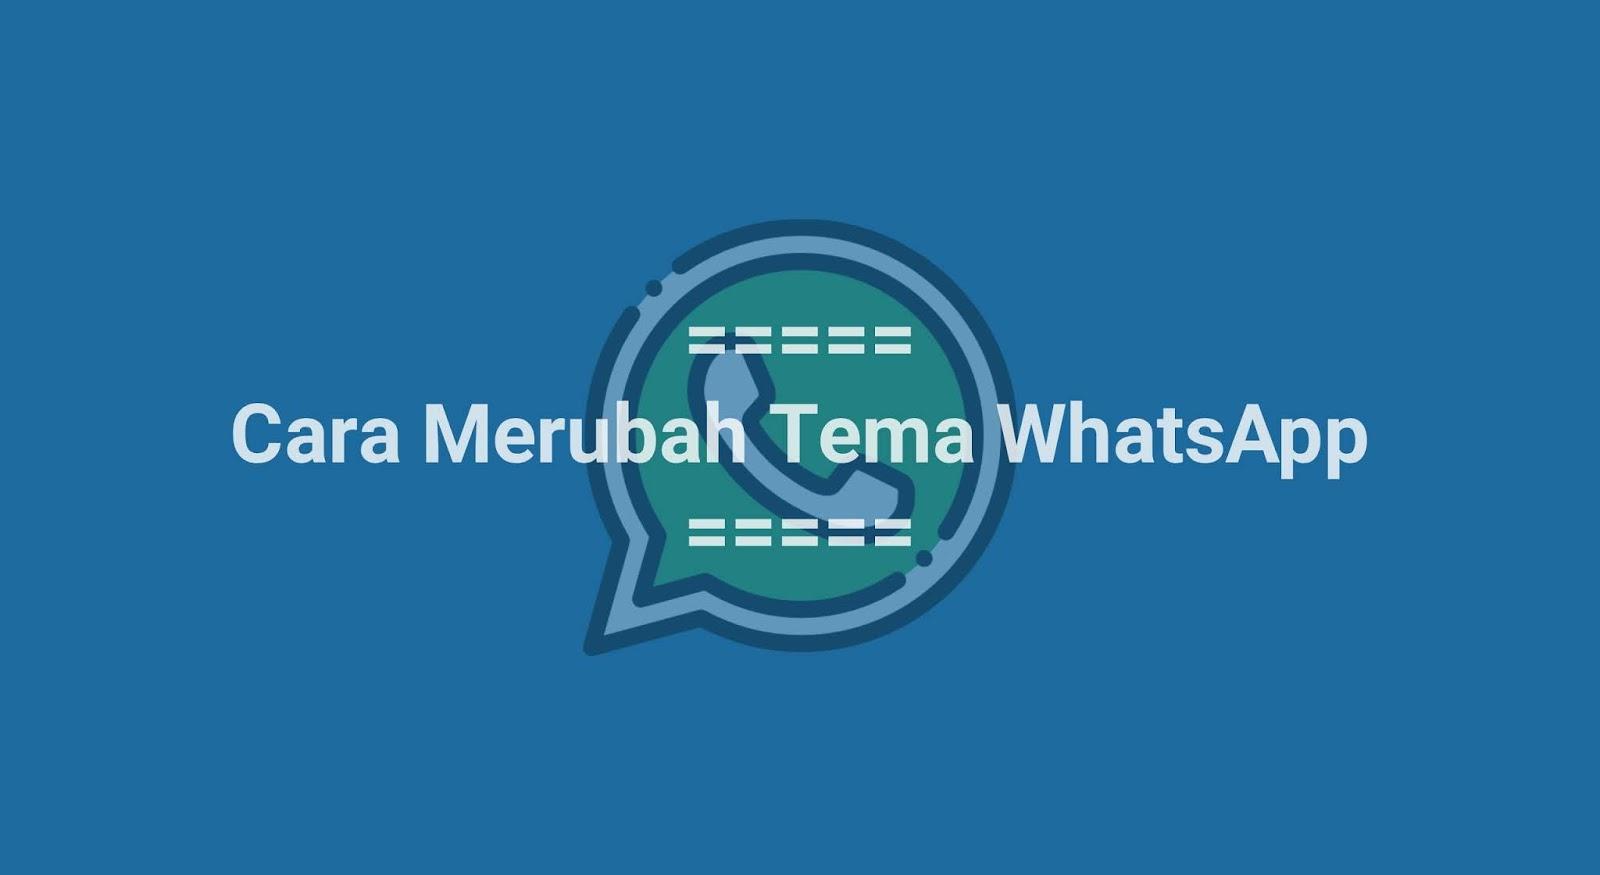 Cara Merubah Tema WhatsApp